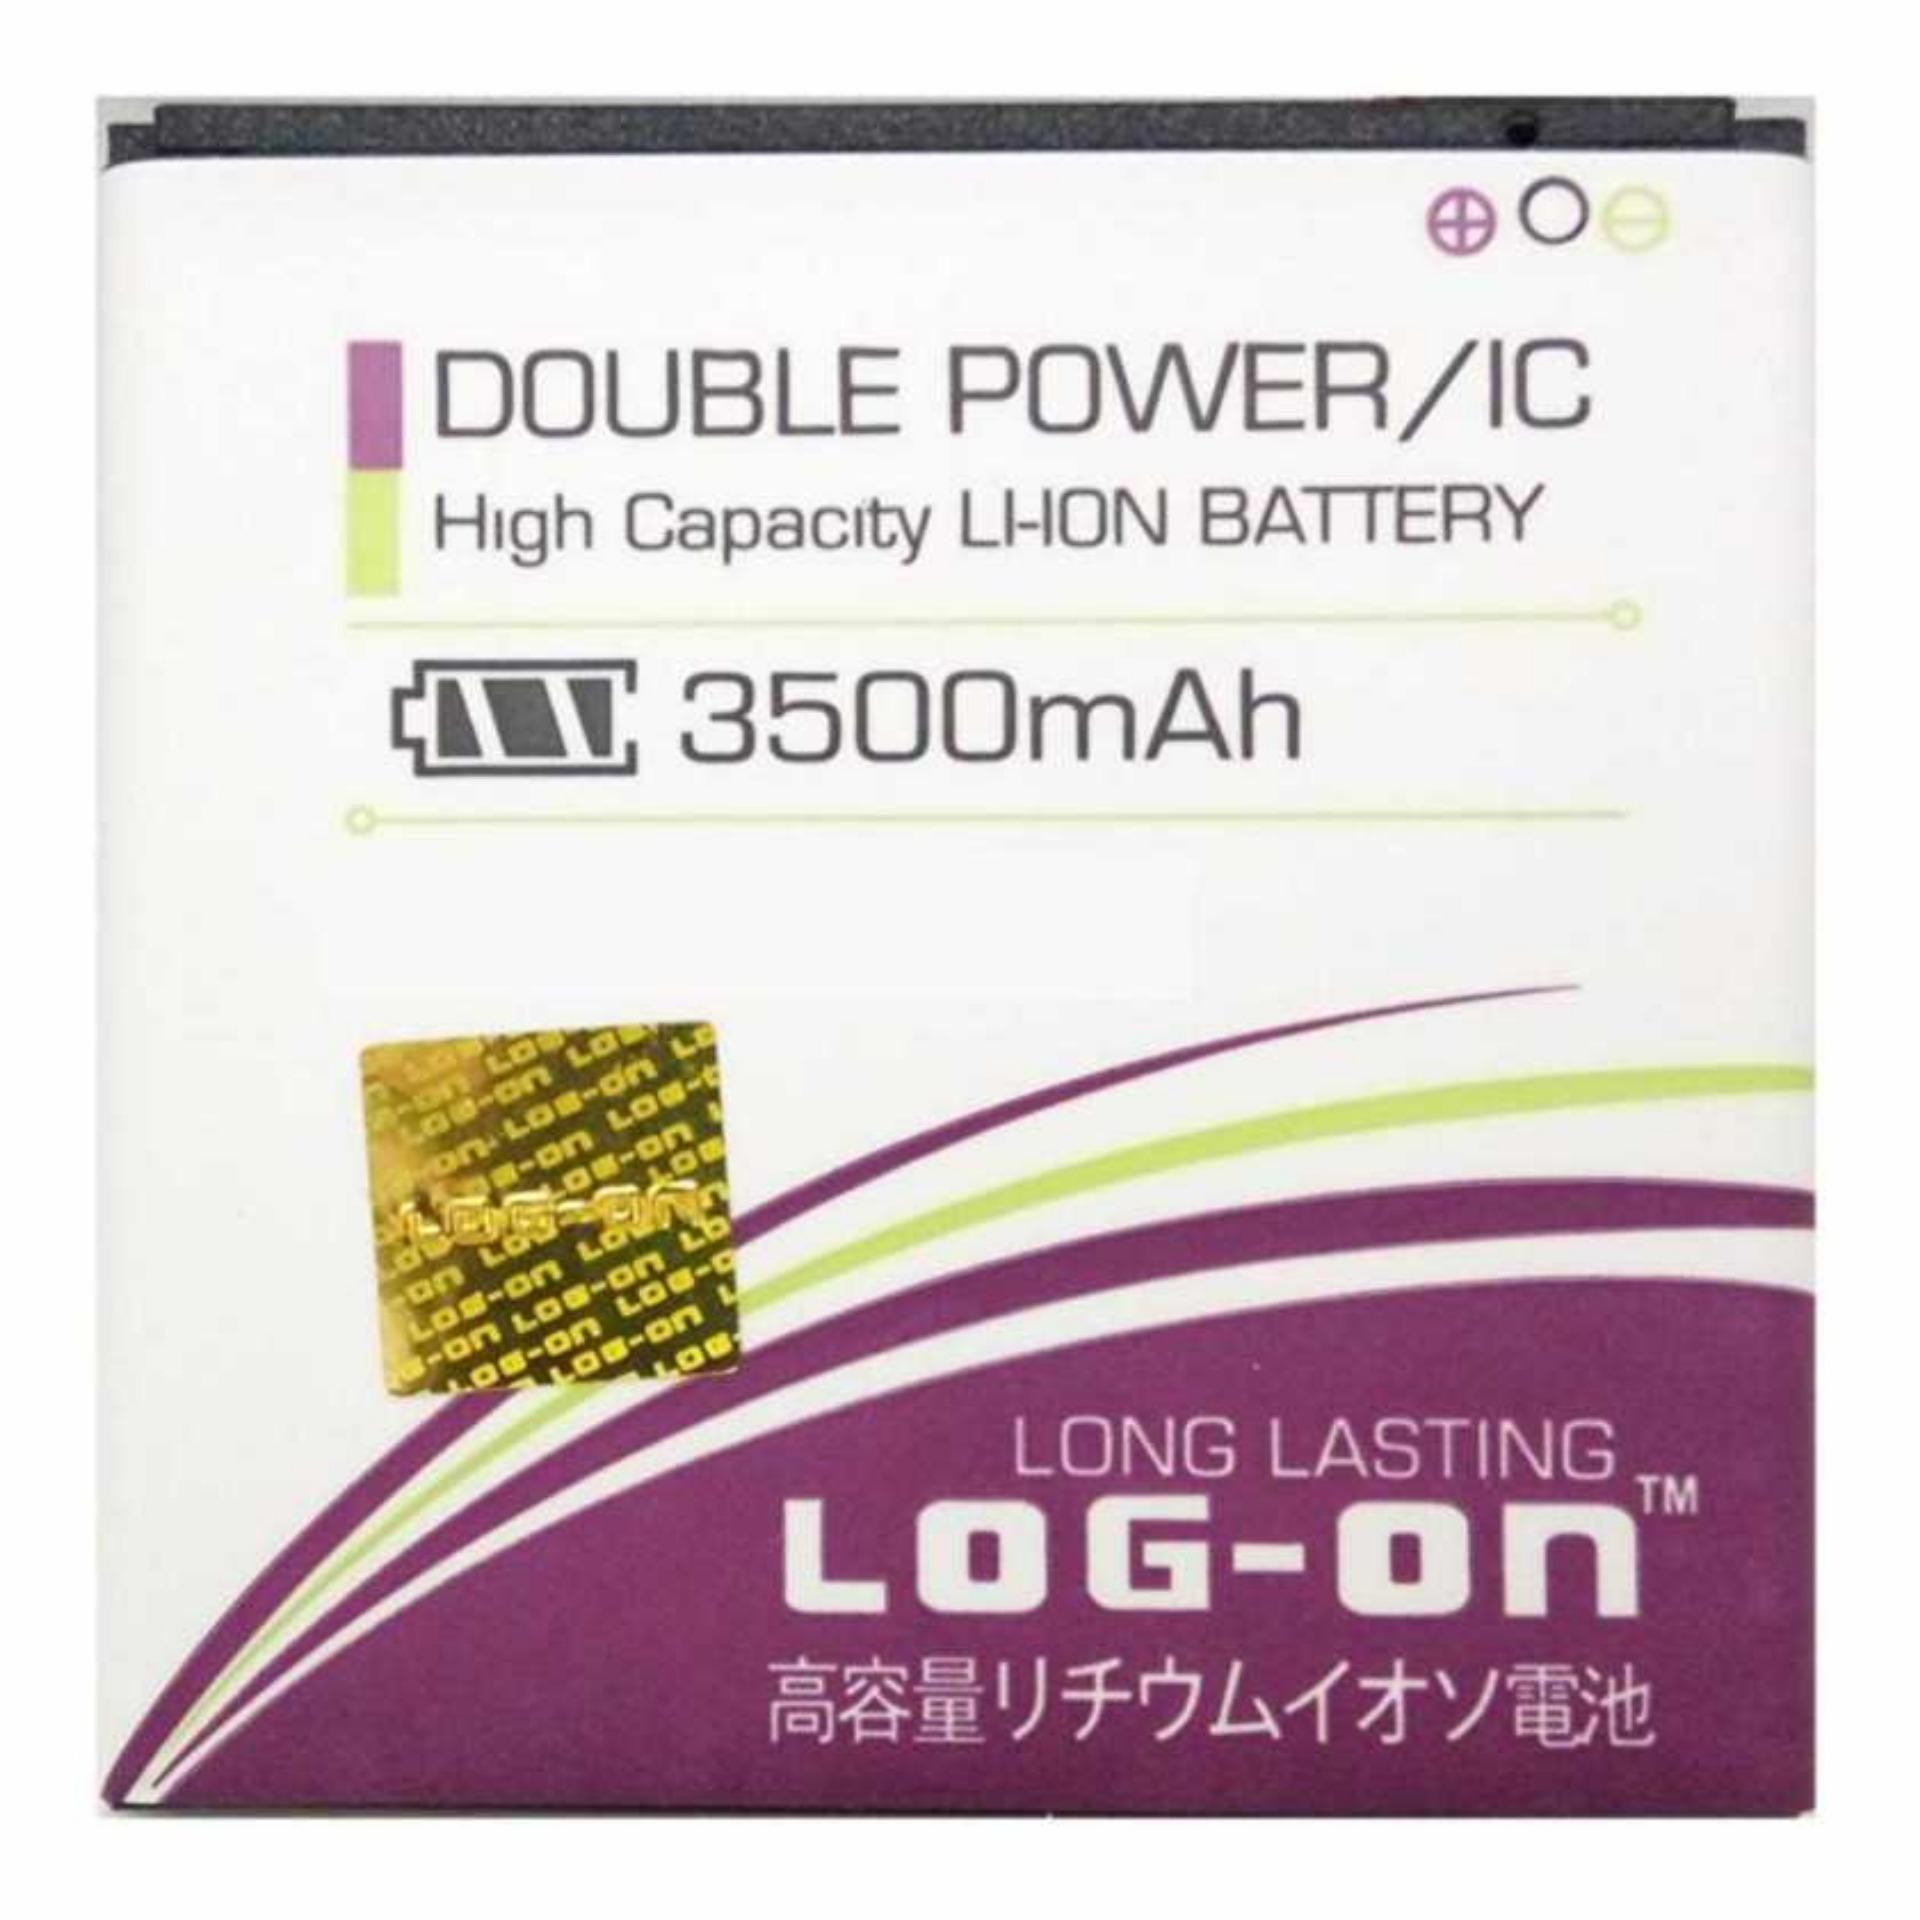 Flash Sale Log On Battery Baterai Double Power EP500 SONY ERICSSON ST15i - 3500mah